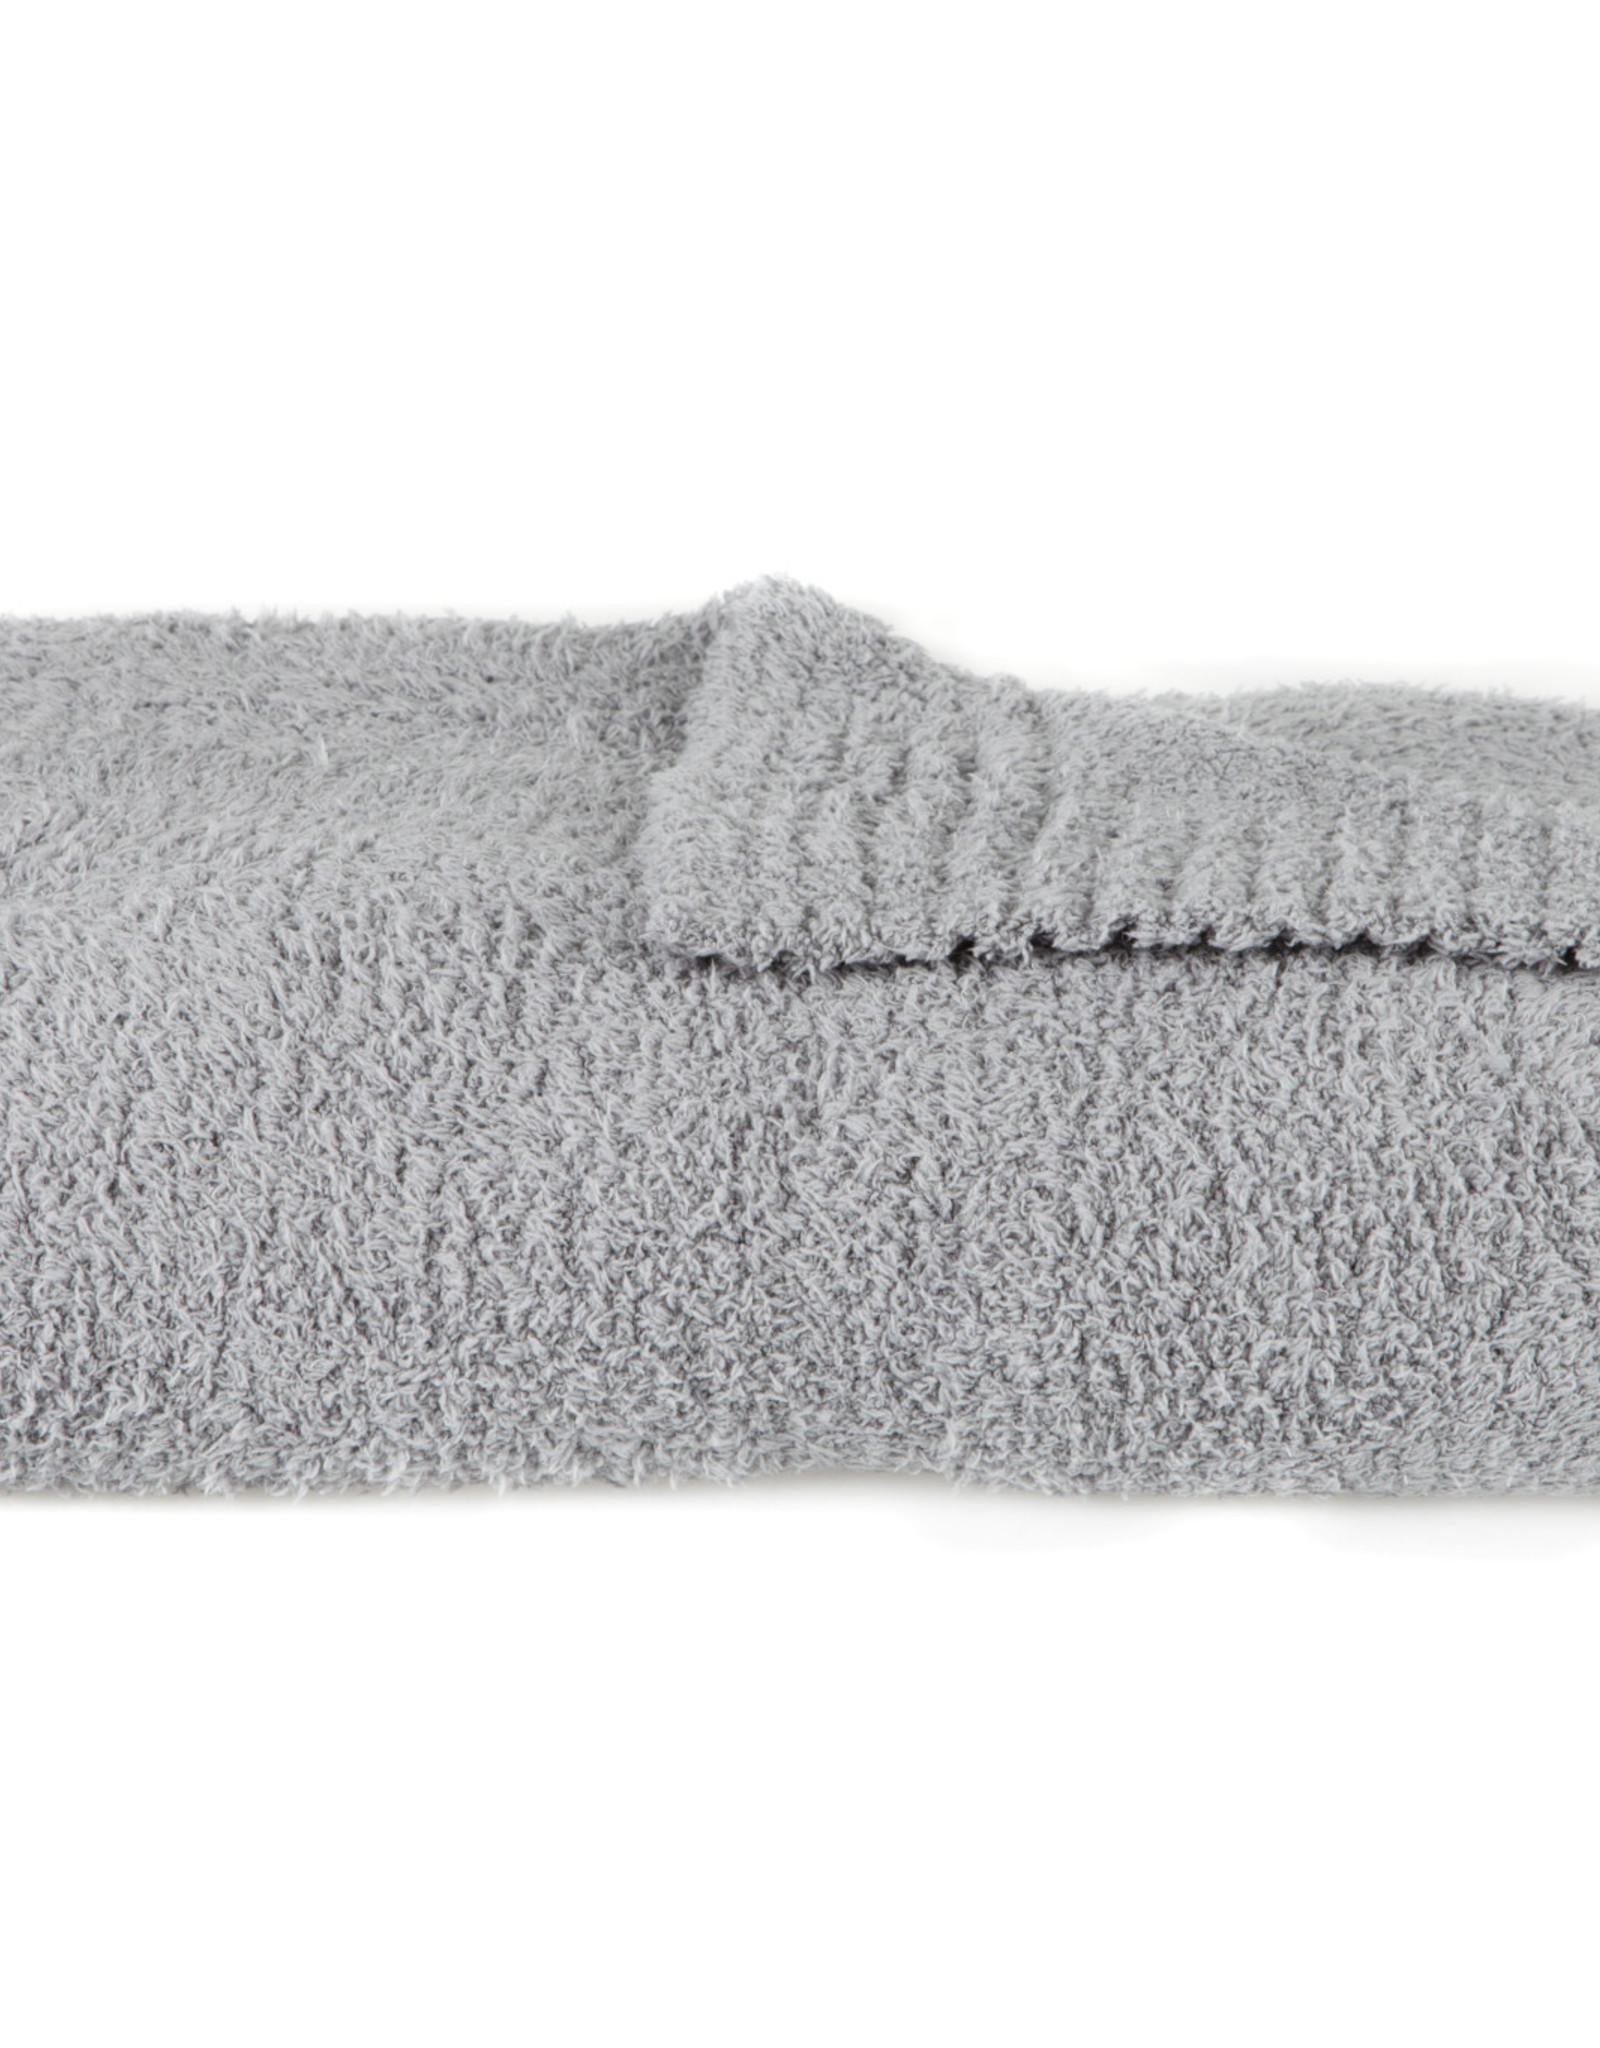 Saranoni Bamboni Receiving Blanket Gray